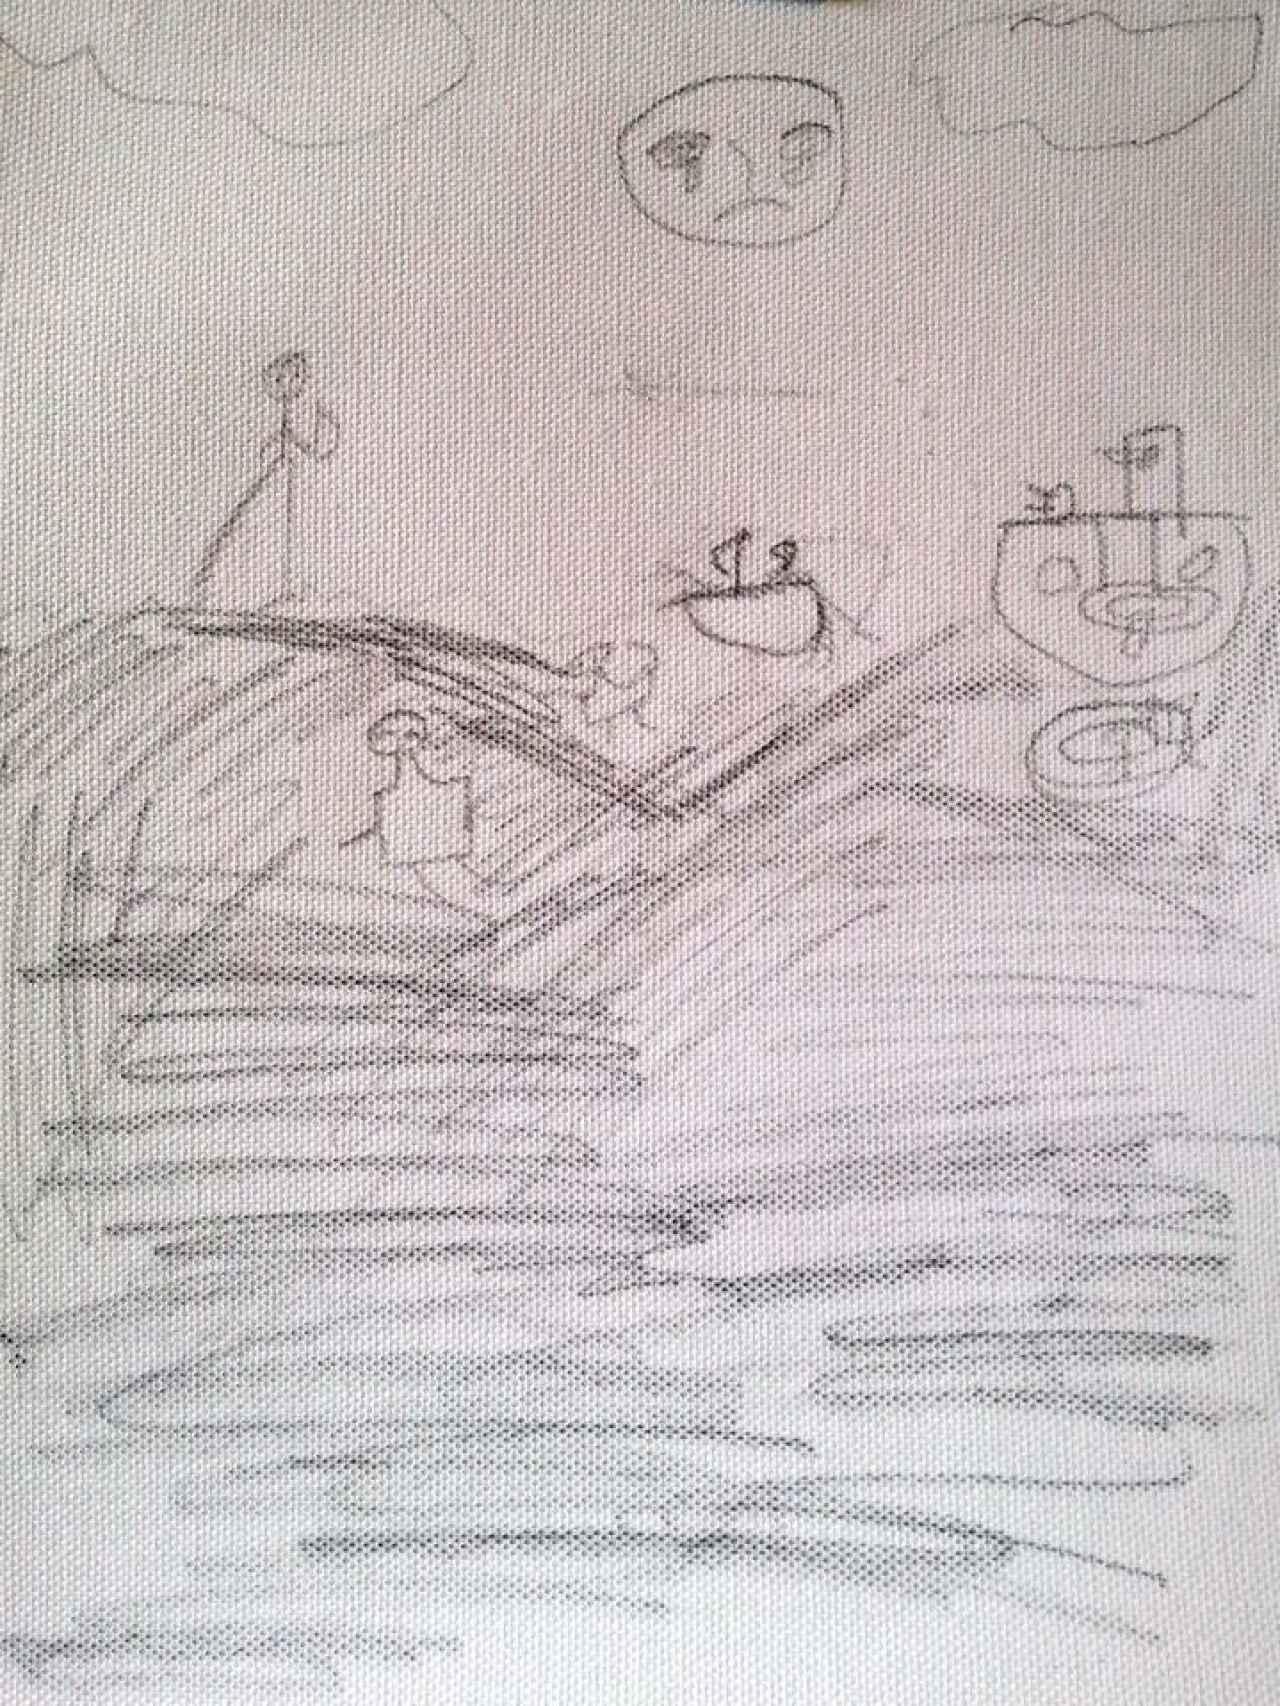 Dibujo de Abdulhamid.